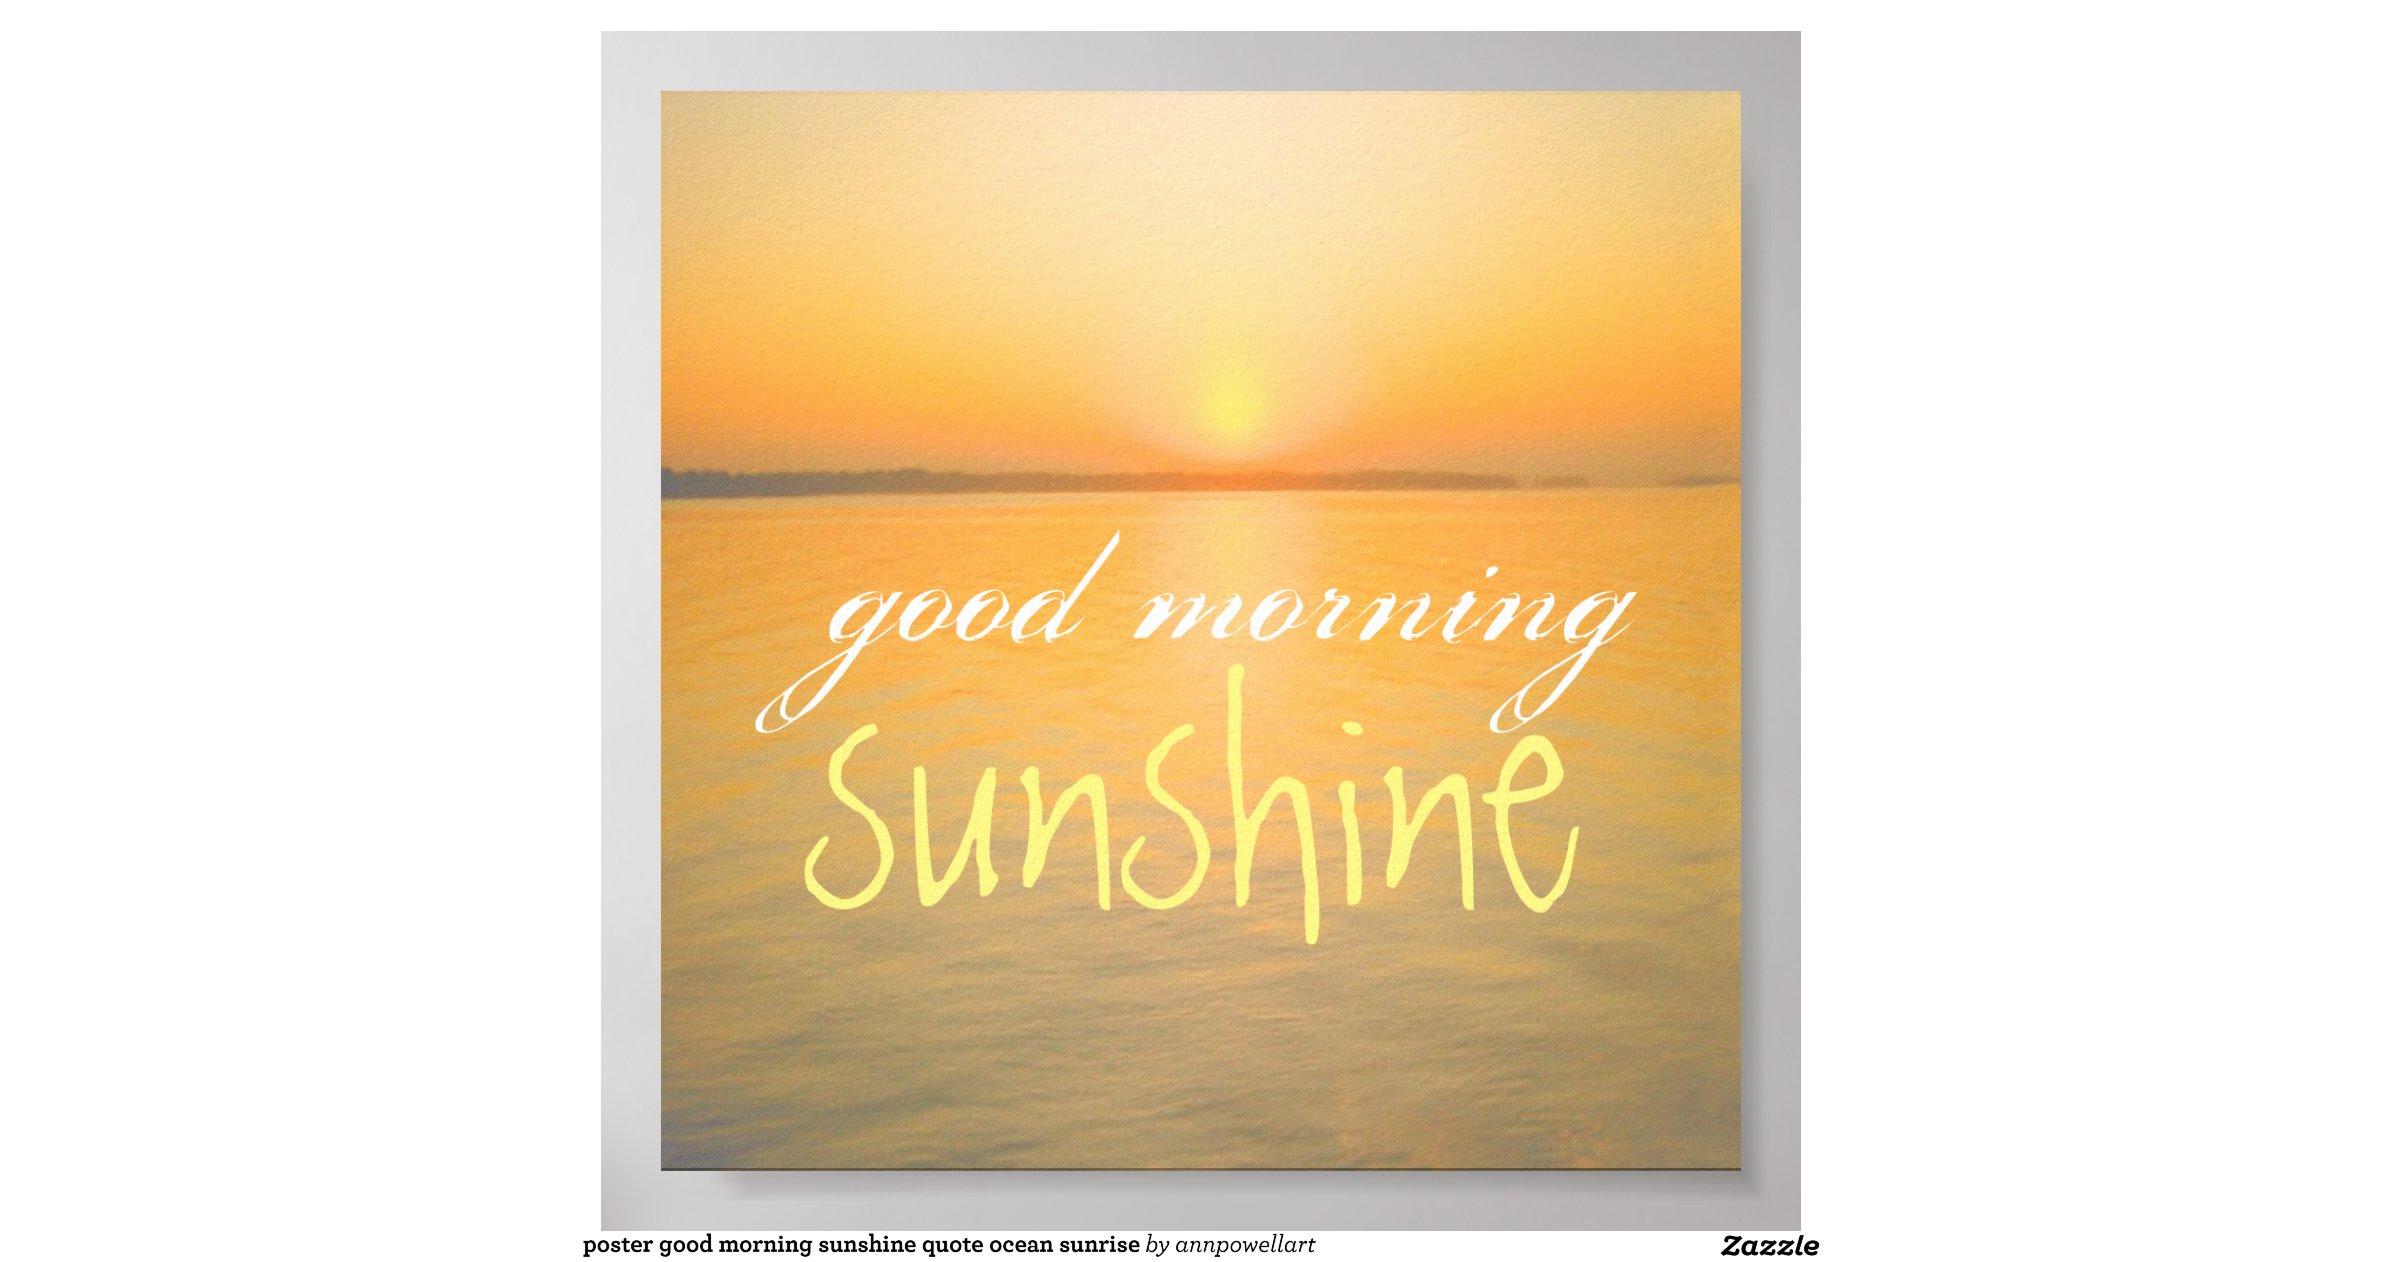 Good Morning Sunshine Quotes: Poster Good Morning Sunshine Quote Ocean Sunrise